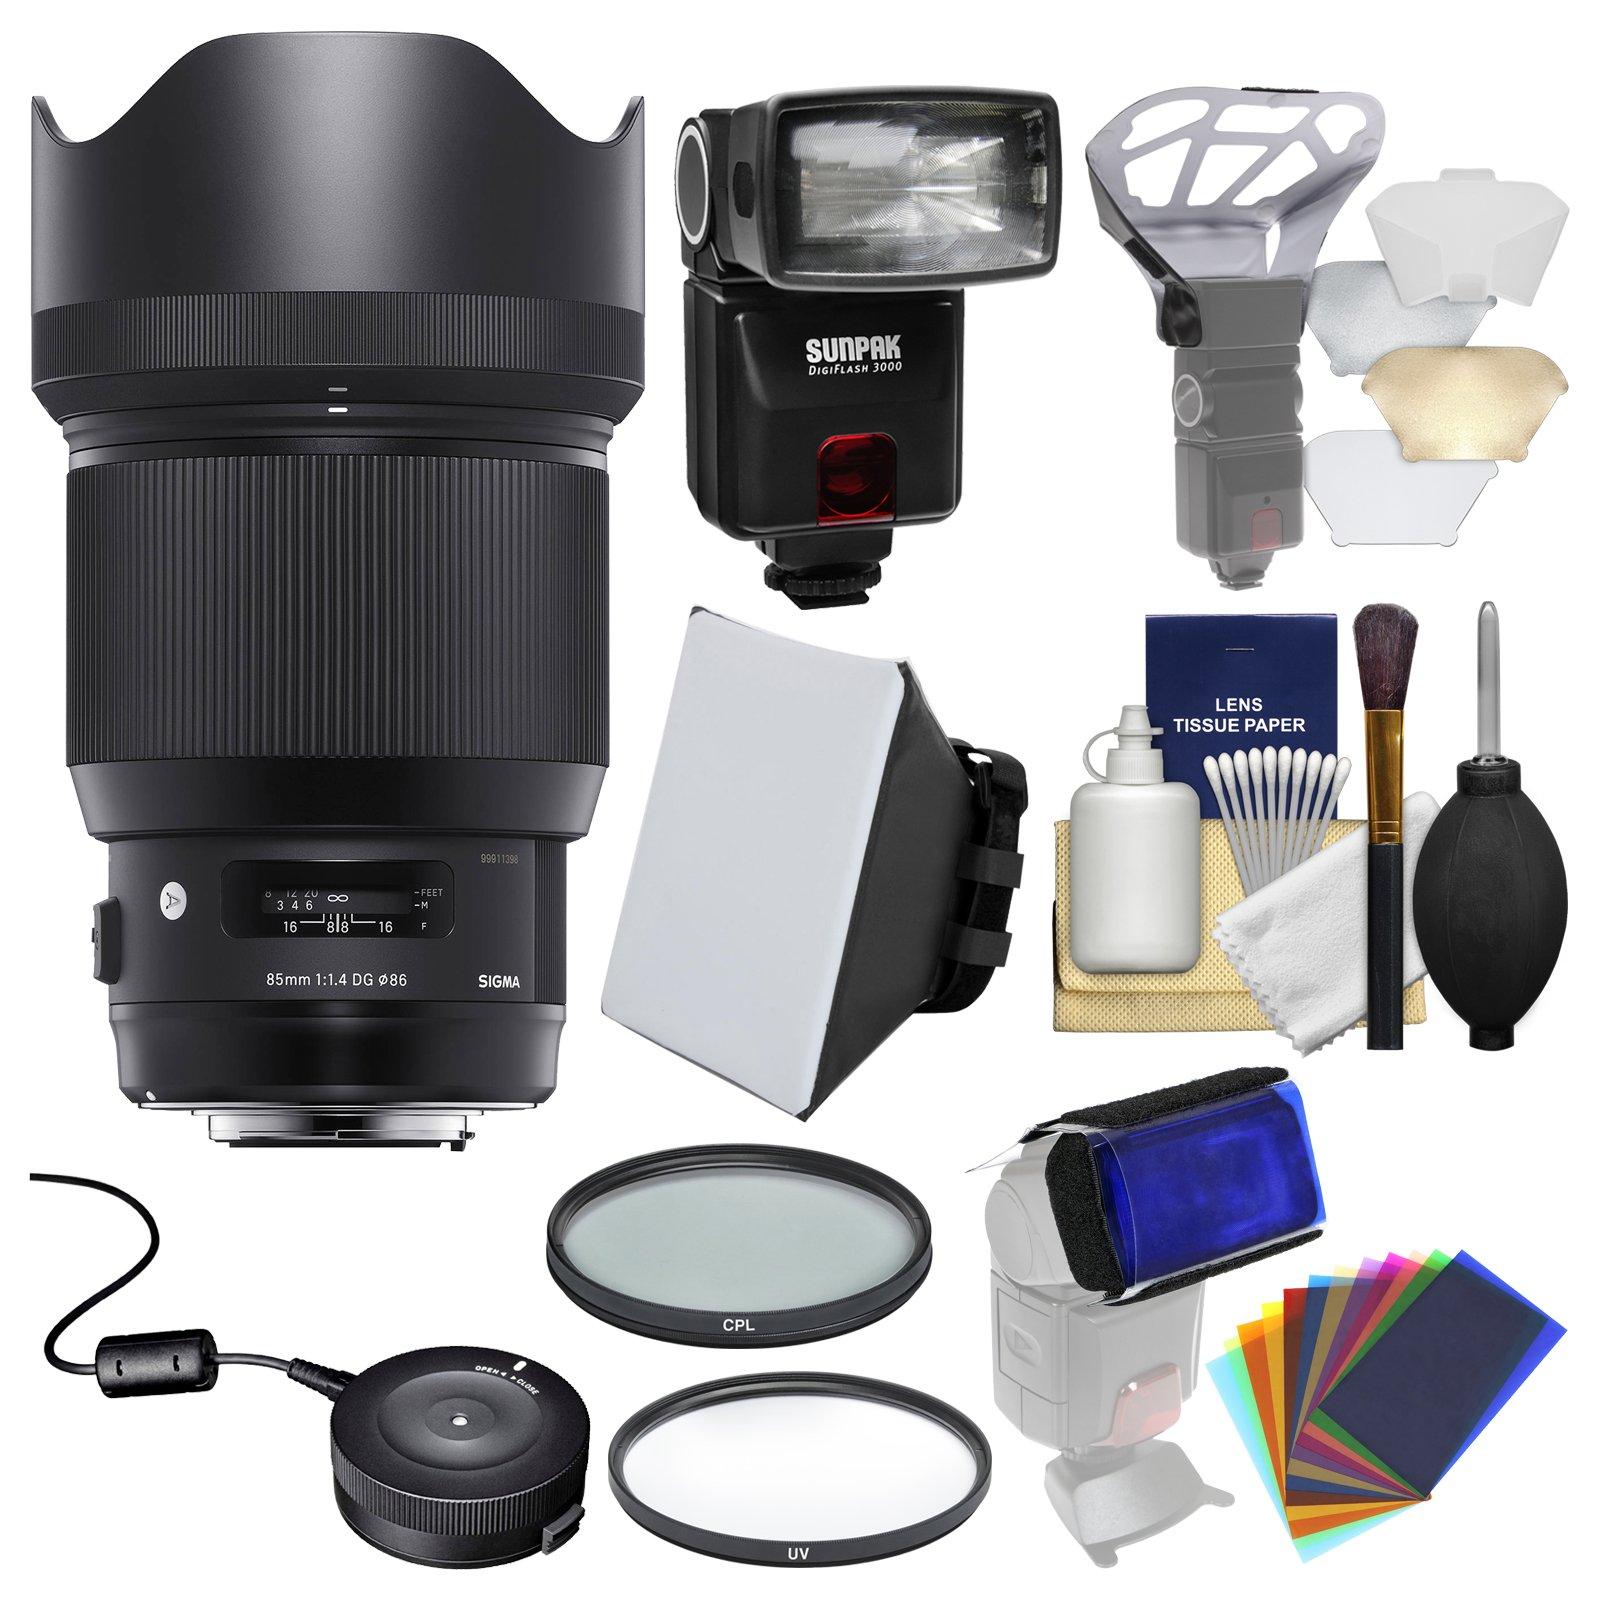 Sigma 85mm f/1.4 ART DG HSM Lens with USB Dock + Flash + 2 (UV/CPL) Filters + Soft Box + Diffuser Bouncer + Kit for Nikon Digital SLR Cameras